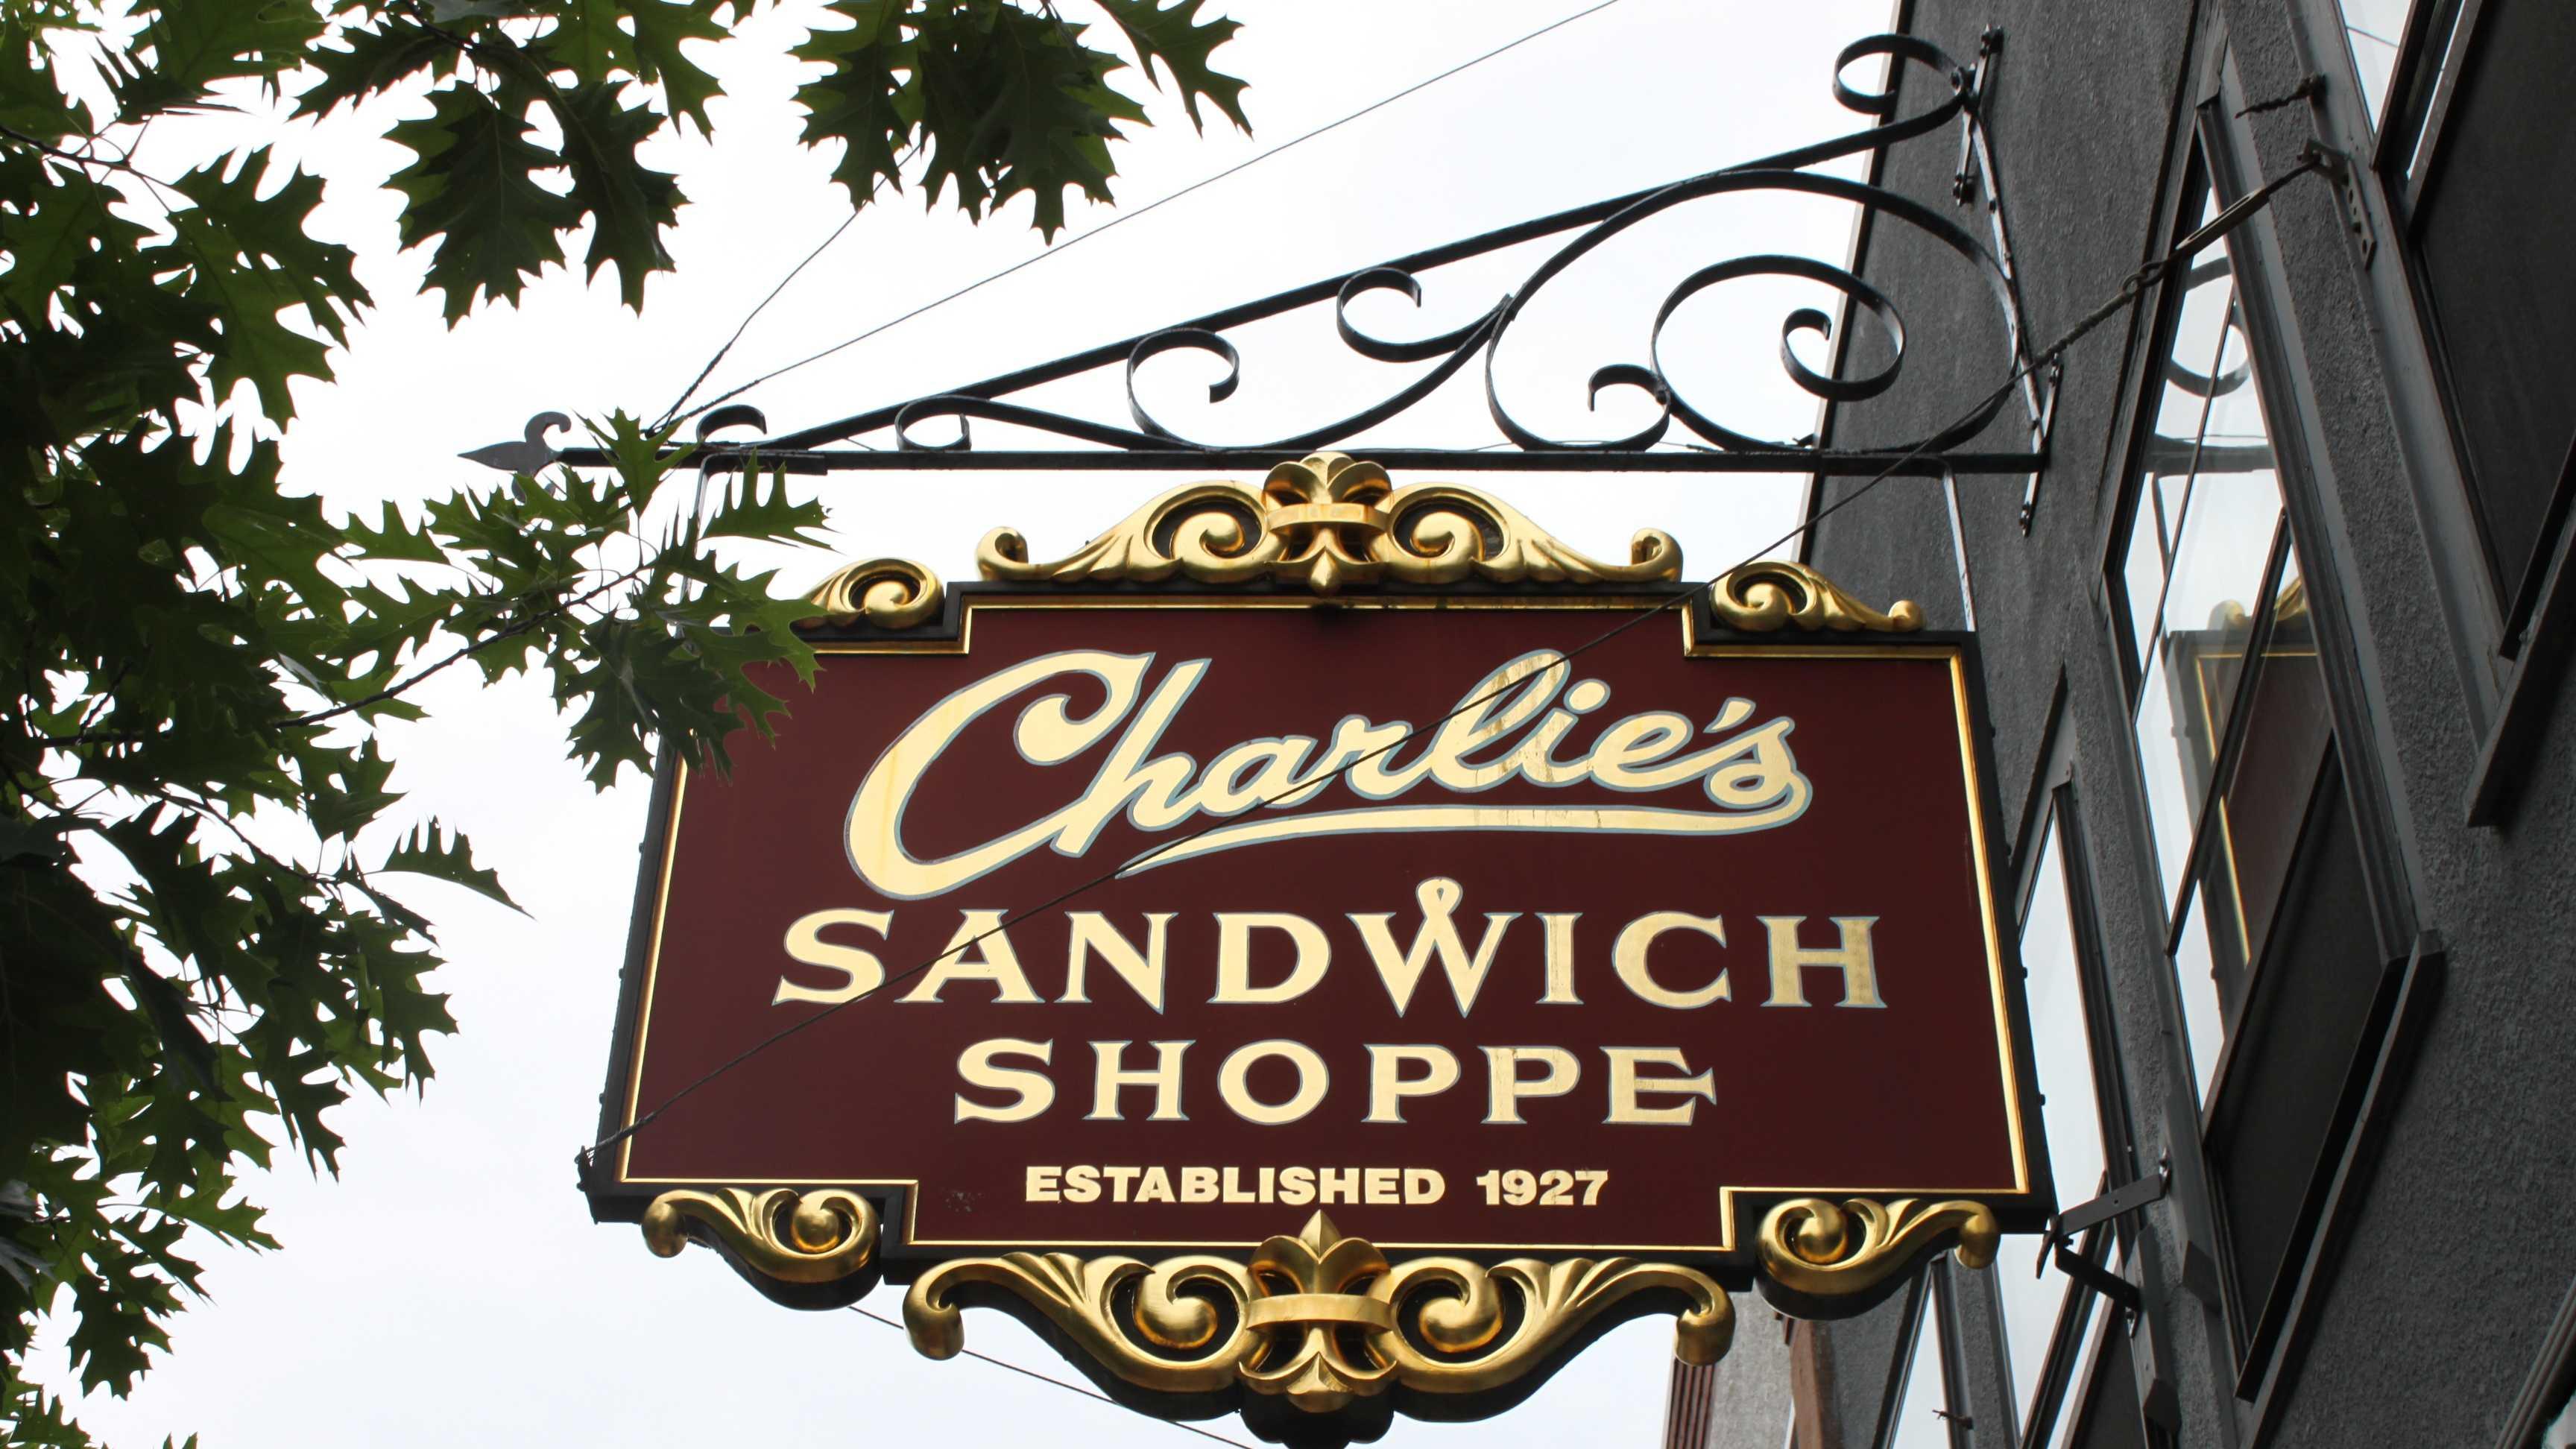 Charliessandwichshoppe061313 (53).JPG